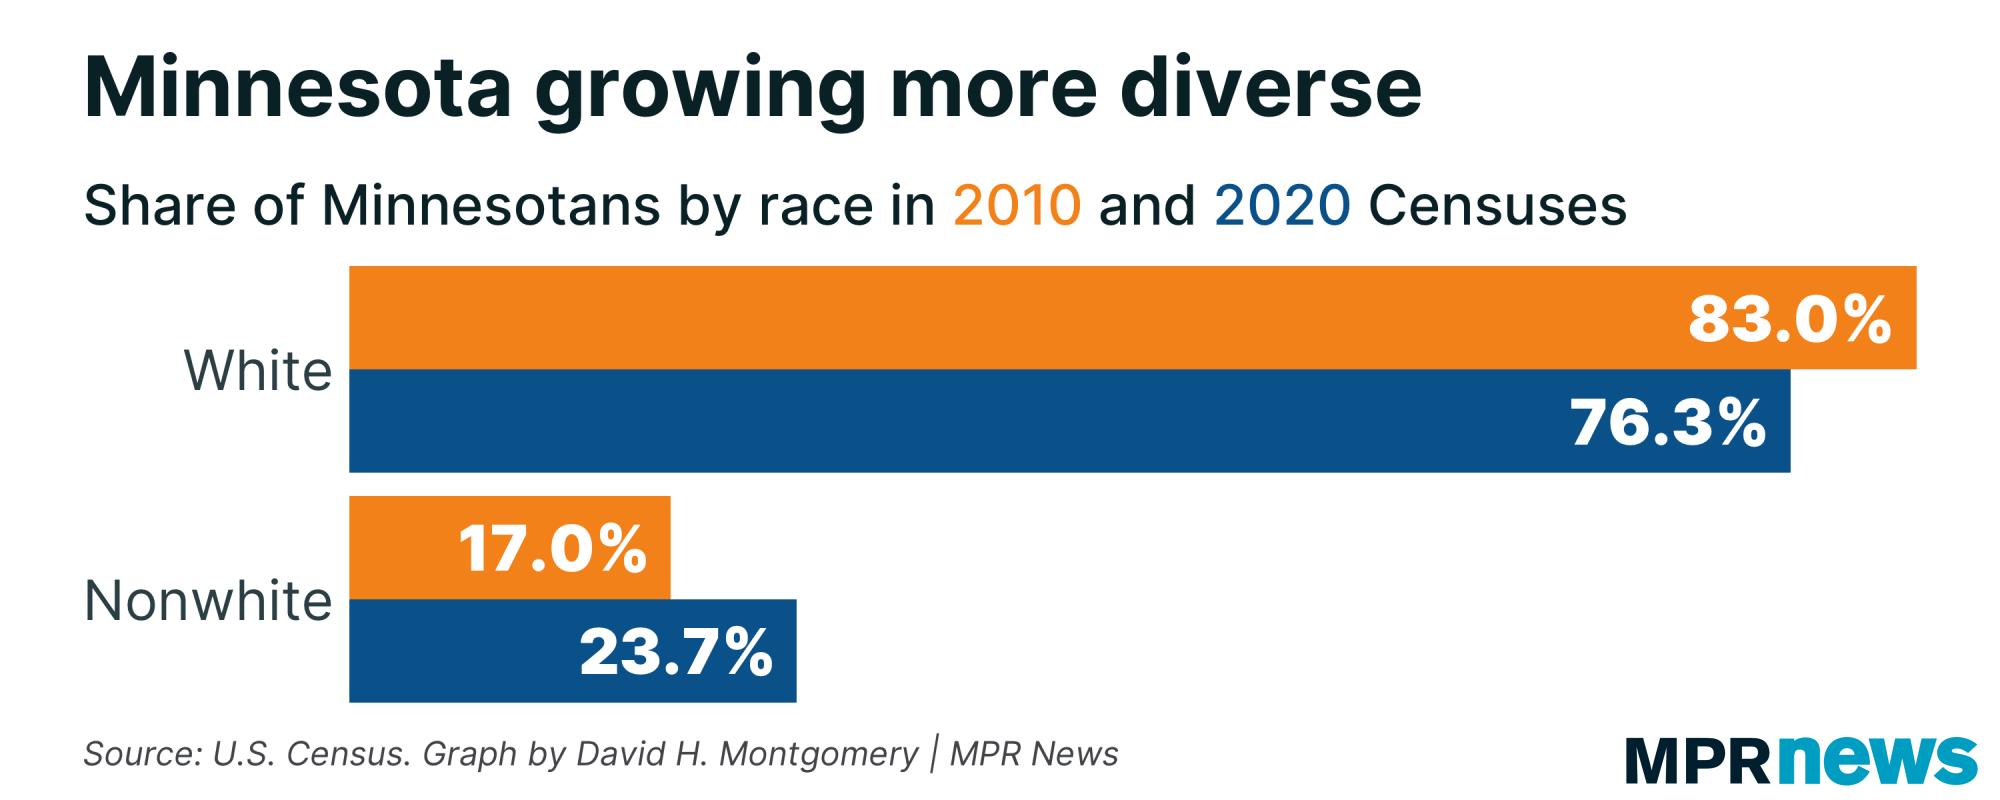 minnesota growing more diverse